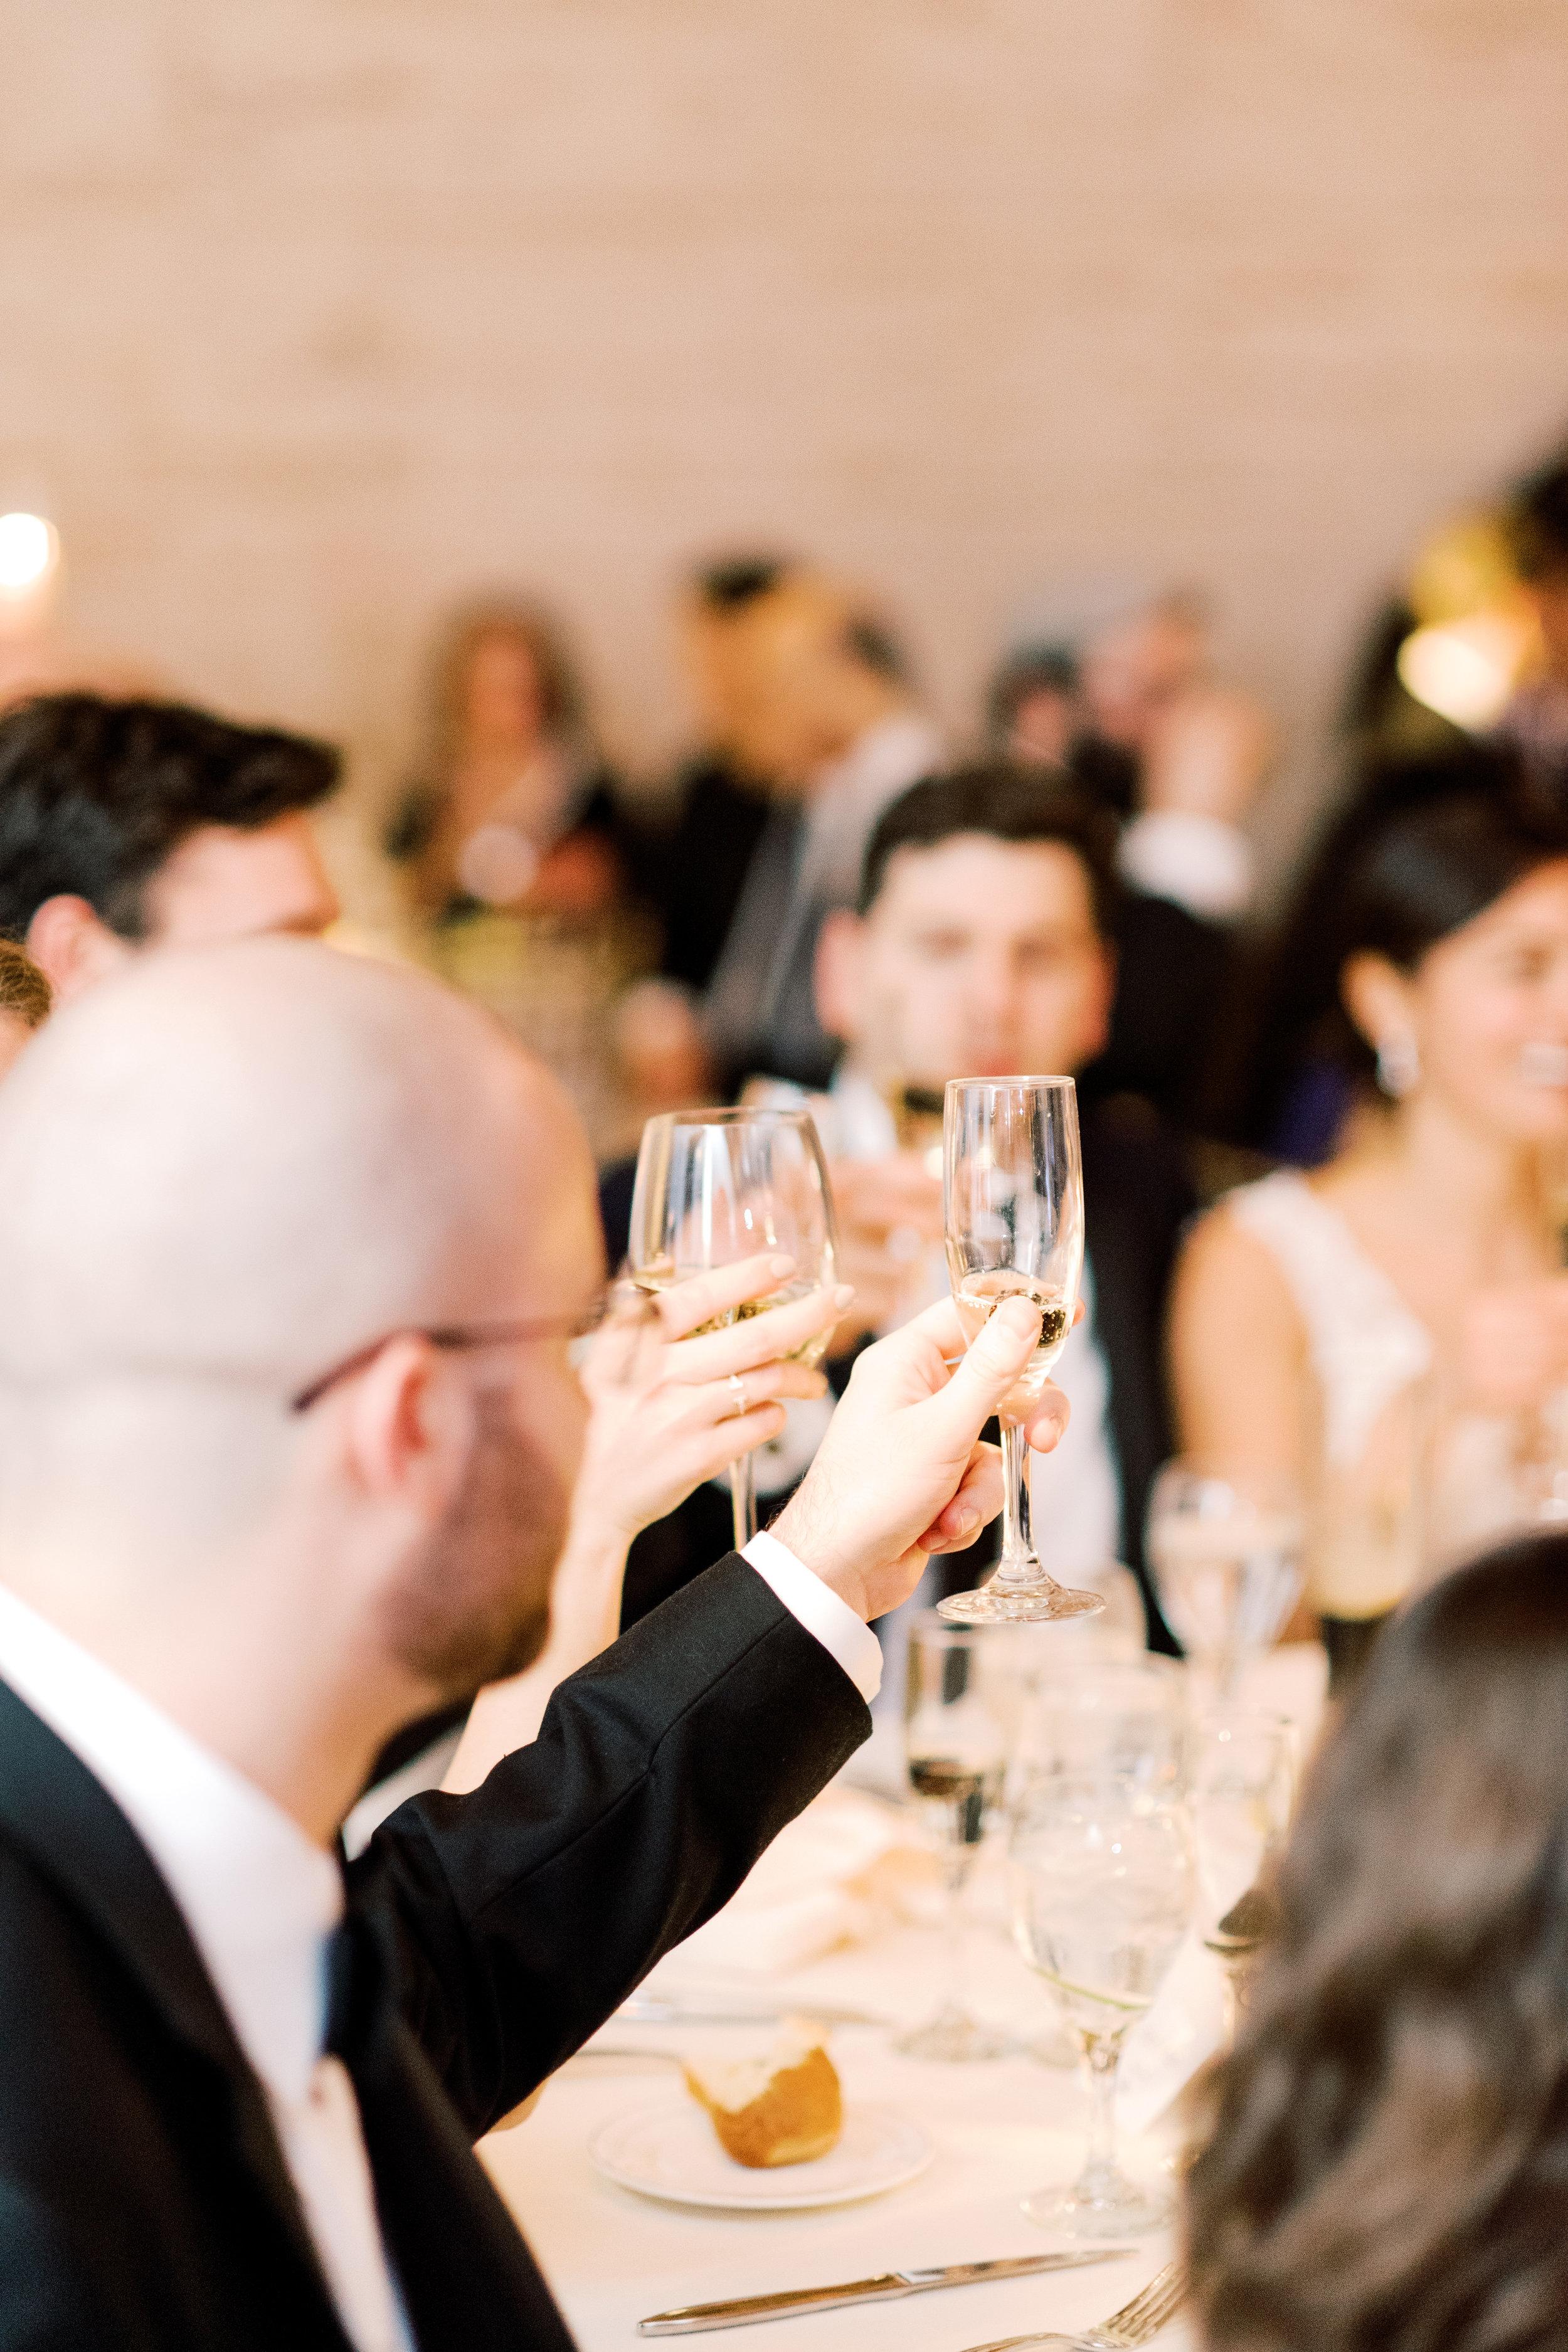 haley-richter-photography-classic-winter-union-trust-philadelphia-wedding-103.jpg